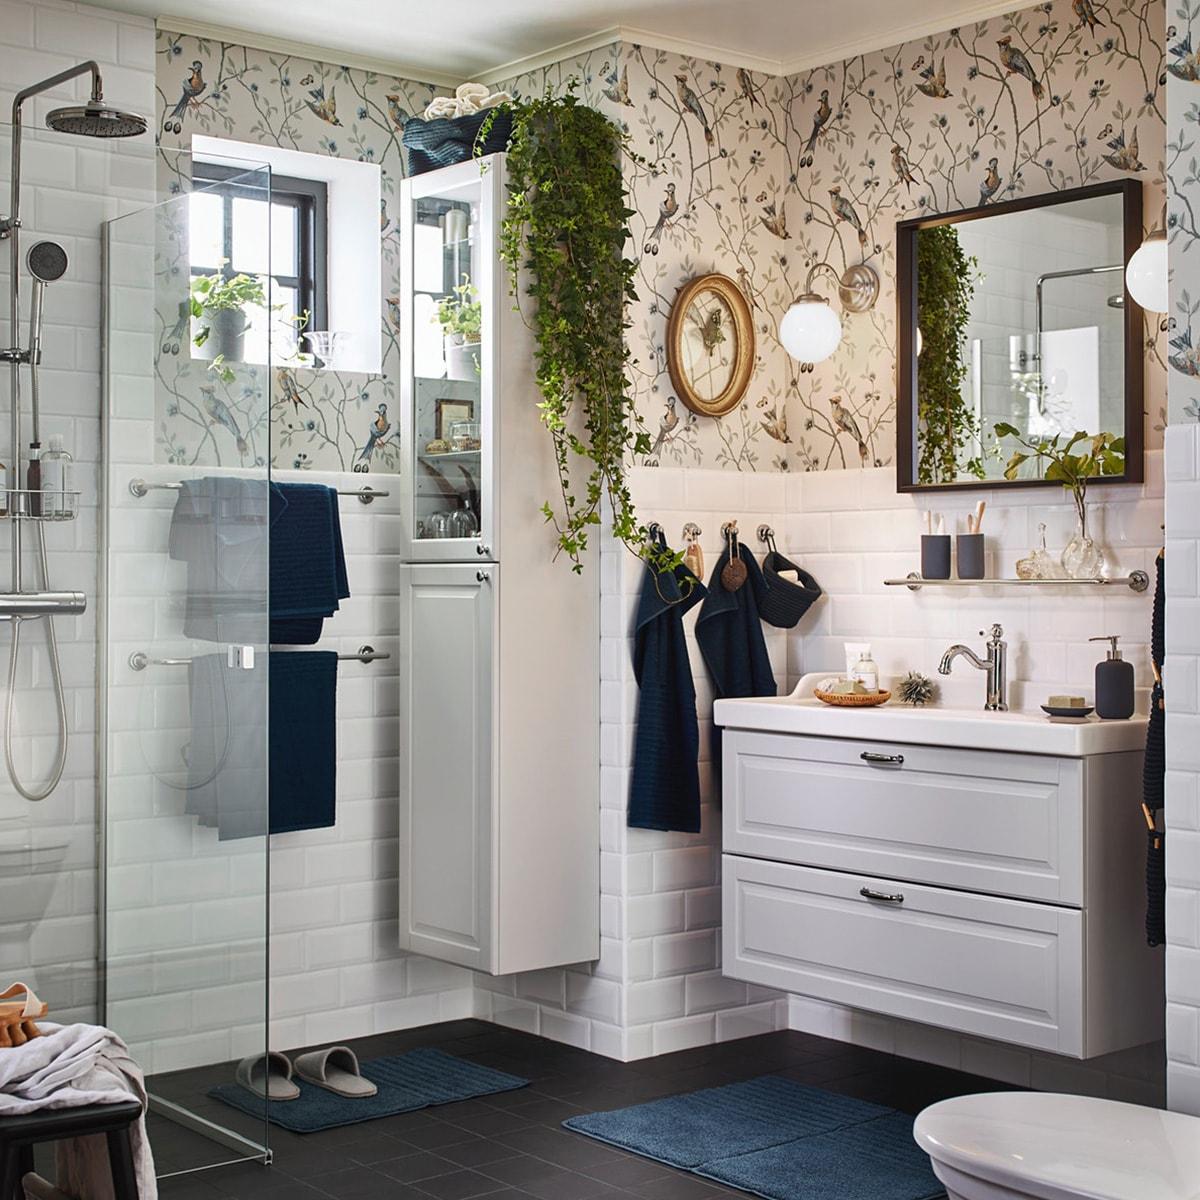 Mobile Bagno Ikea Immagini bathroom gallery - ikea switzerland